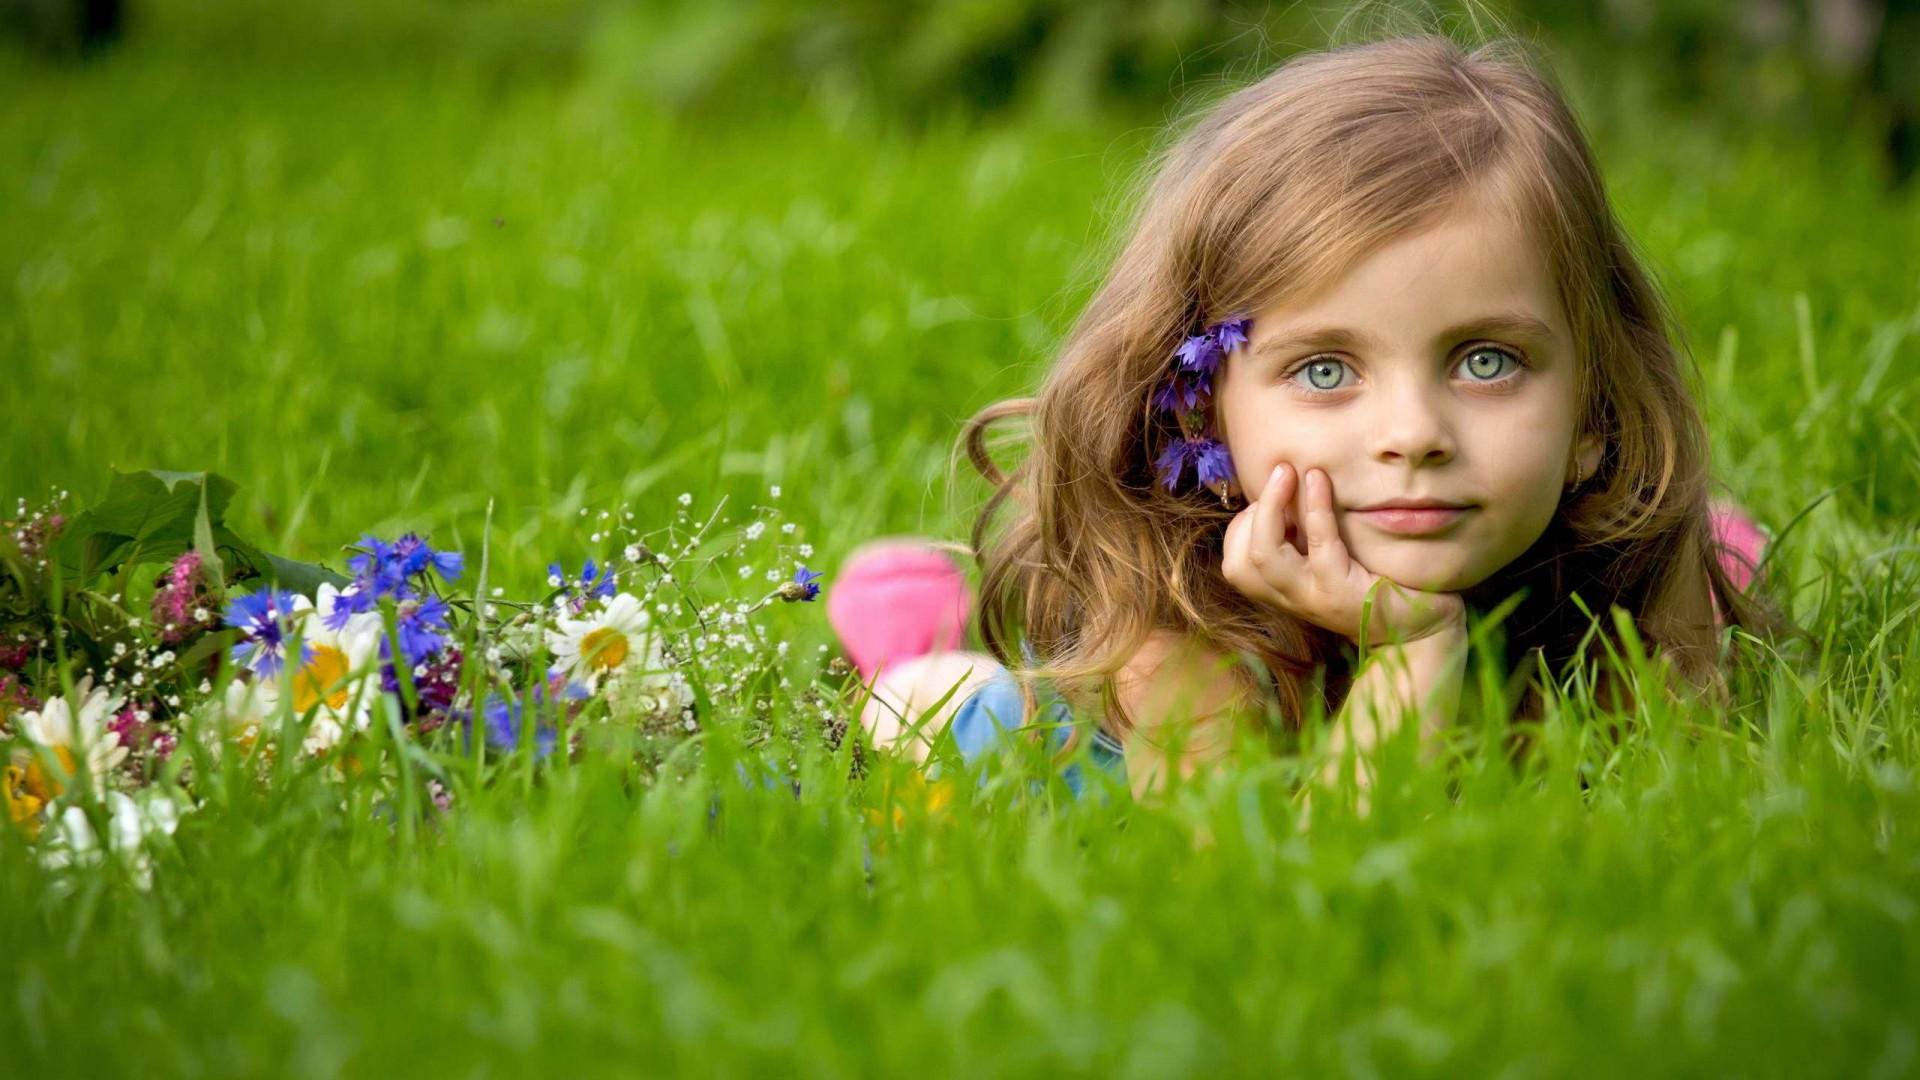 Hd wallpaper cute girl - This Cute Little Girl Hd Wallpaper Has Recently Added In Stylish Hd